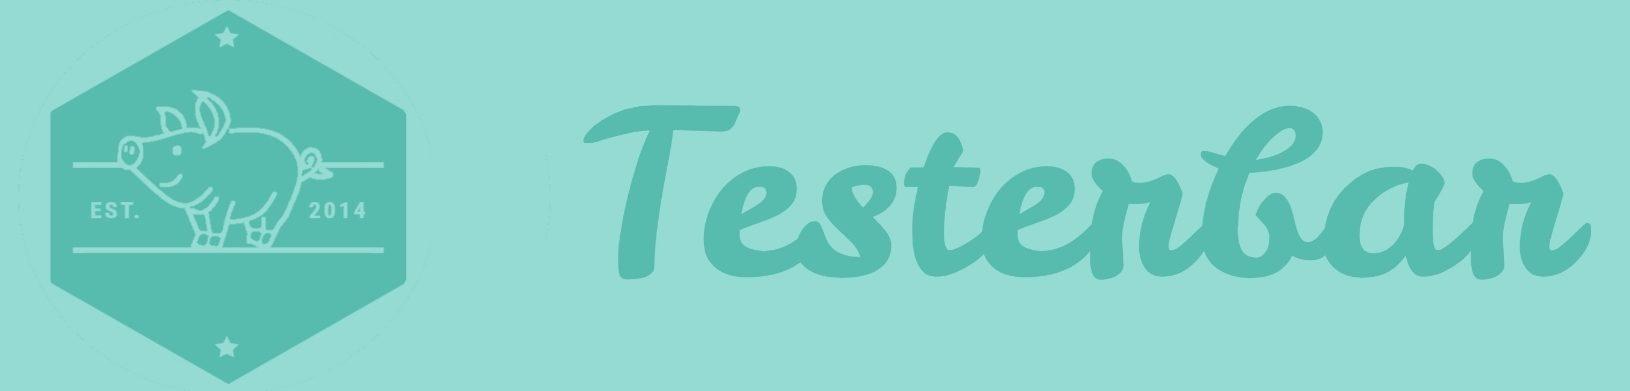 testerbar